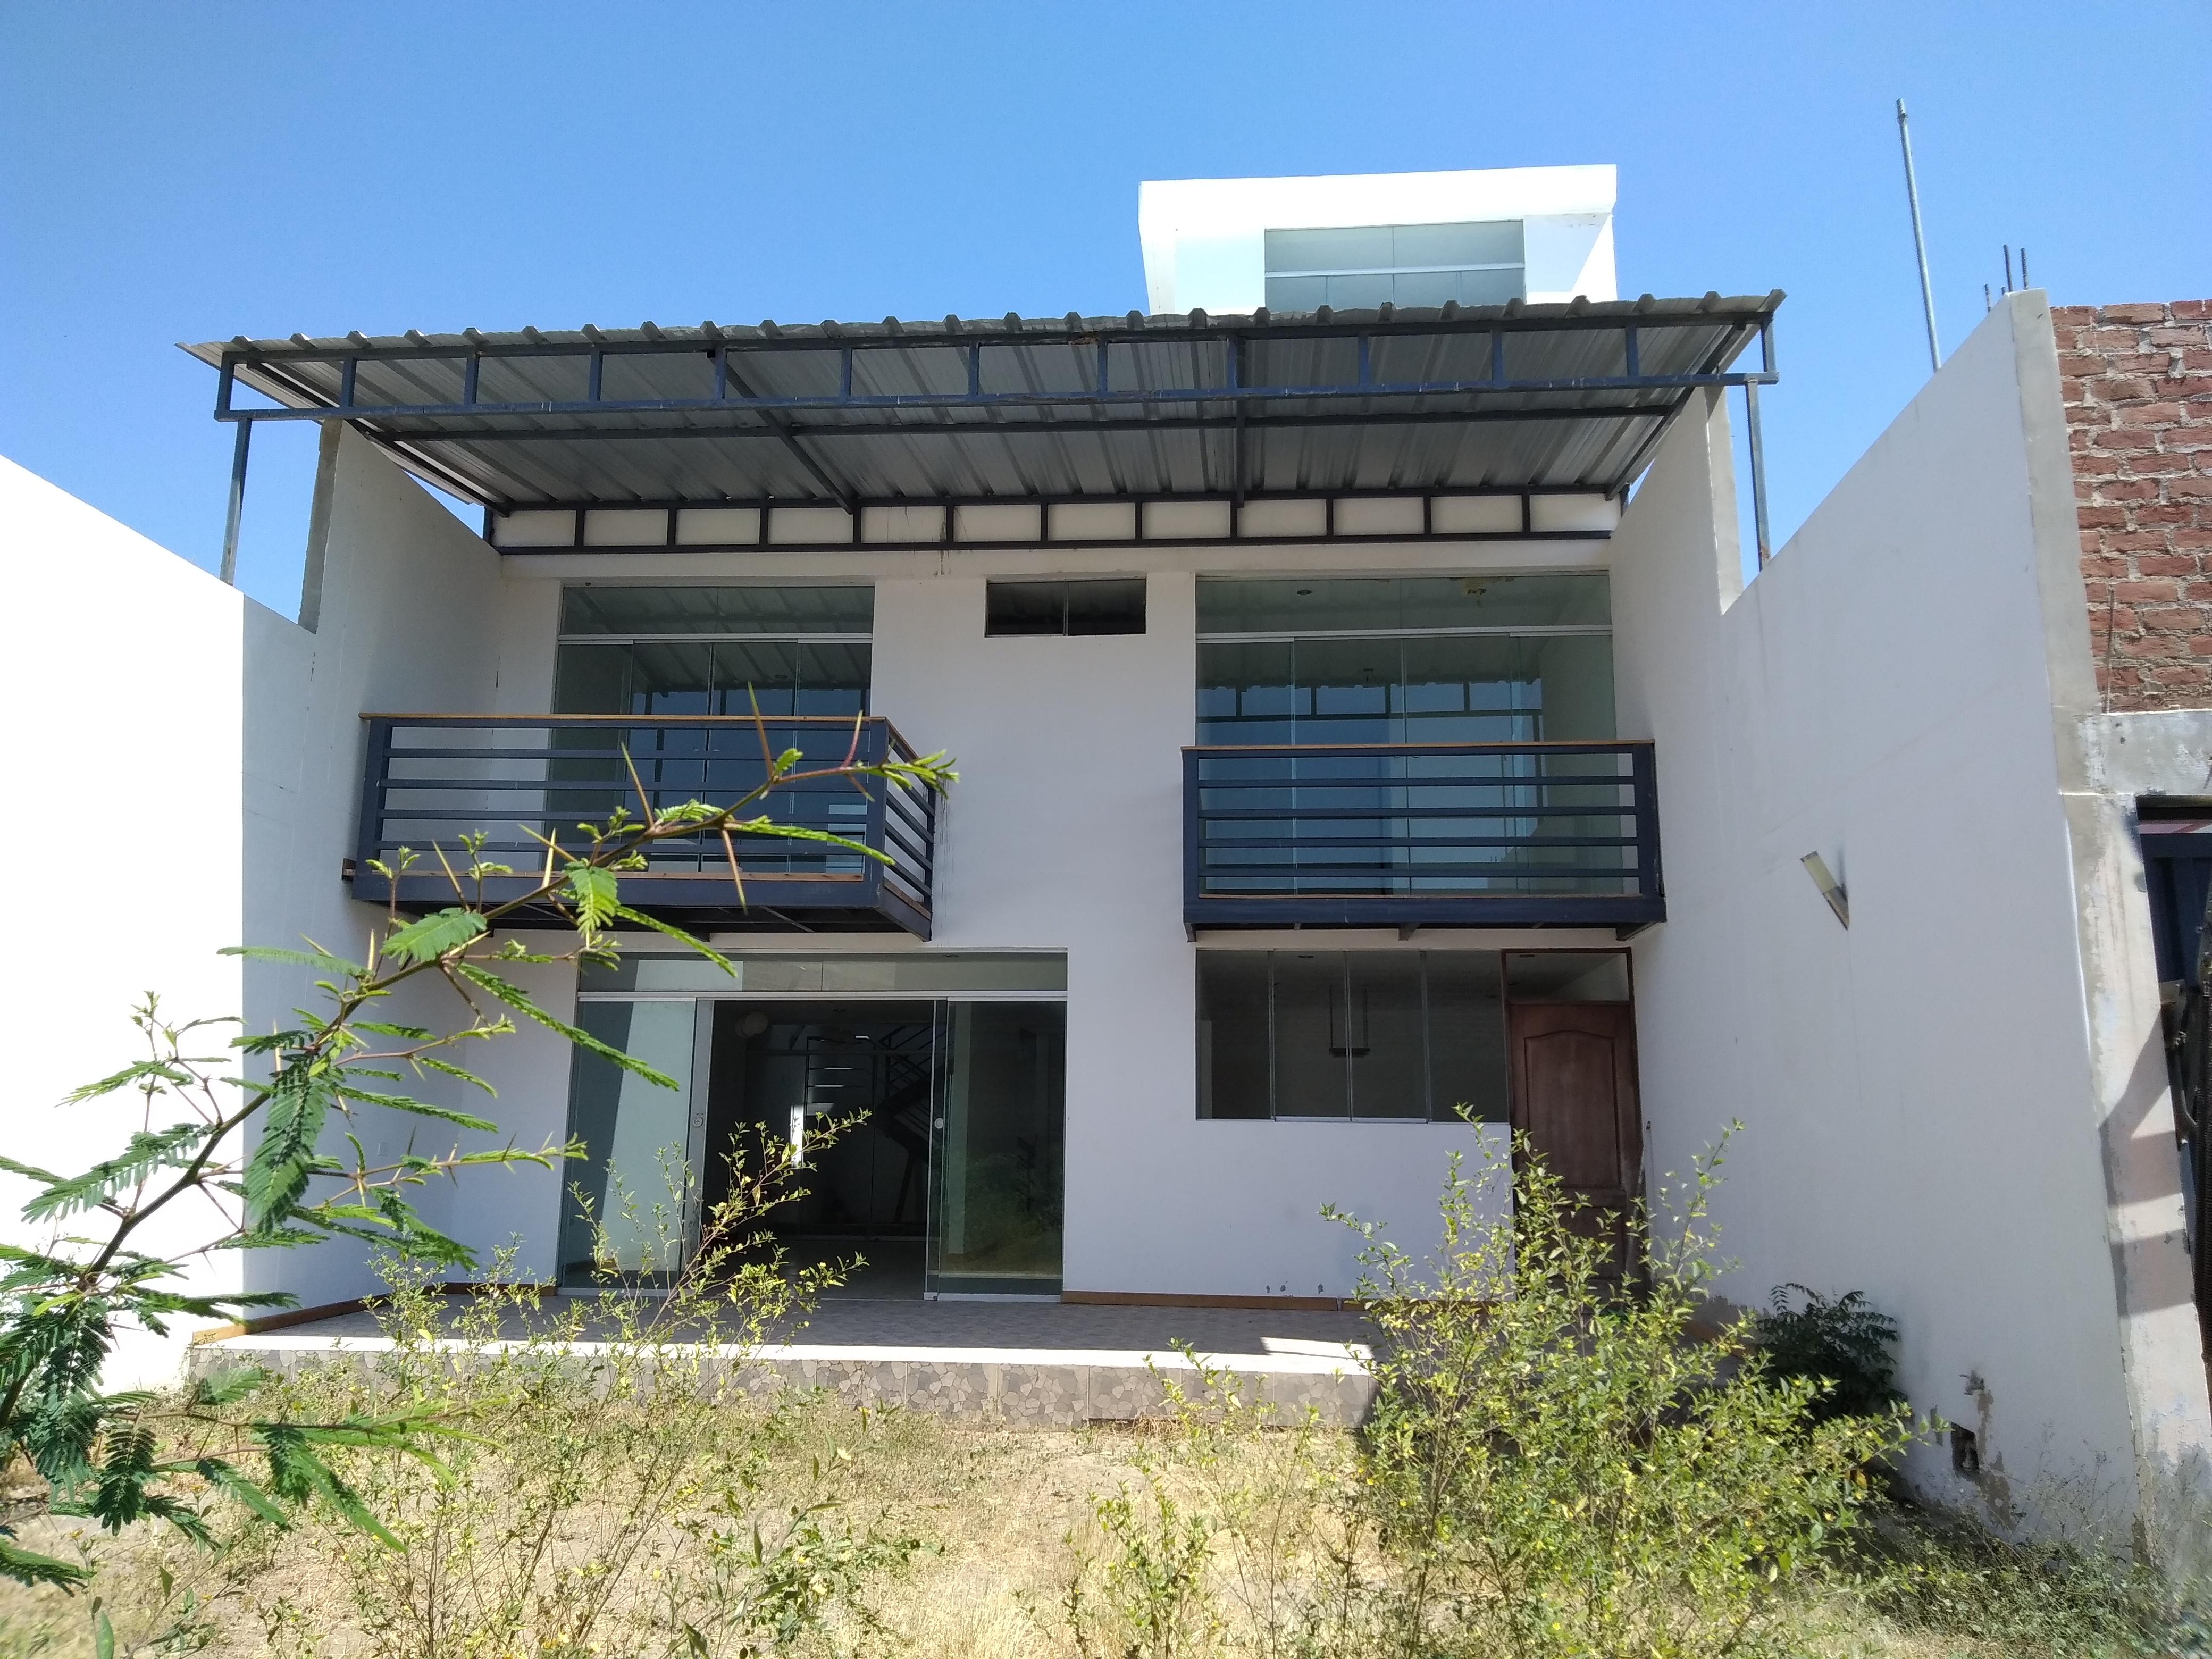 Venta de casa en piura piura goplaceit for Inmobiliaria 3 casas